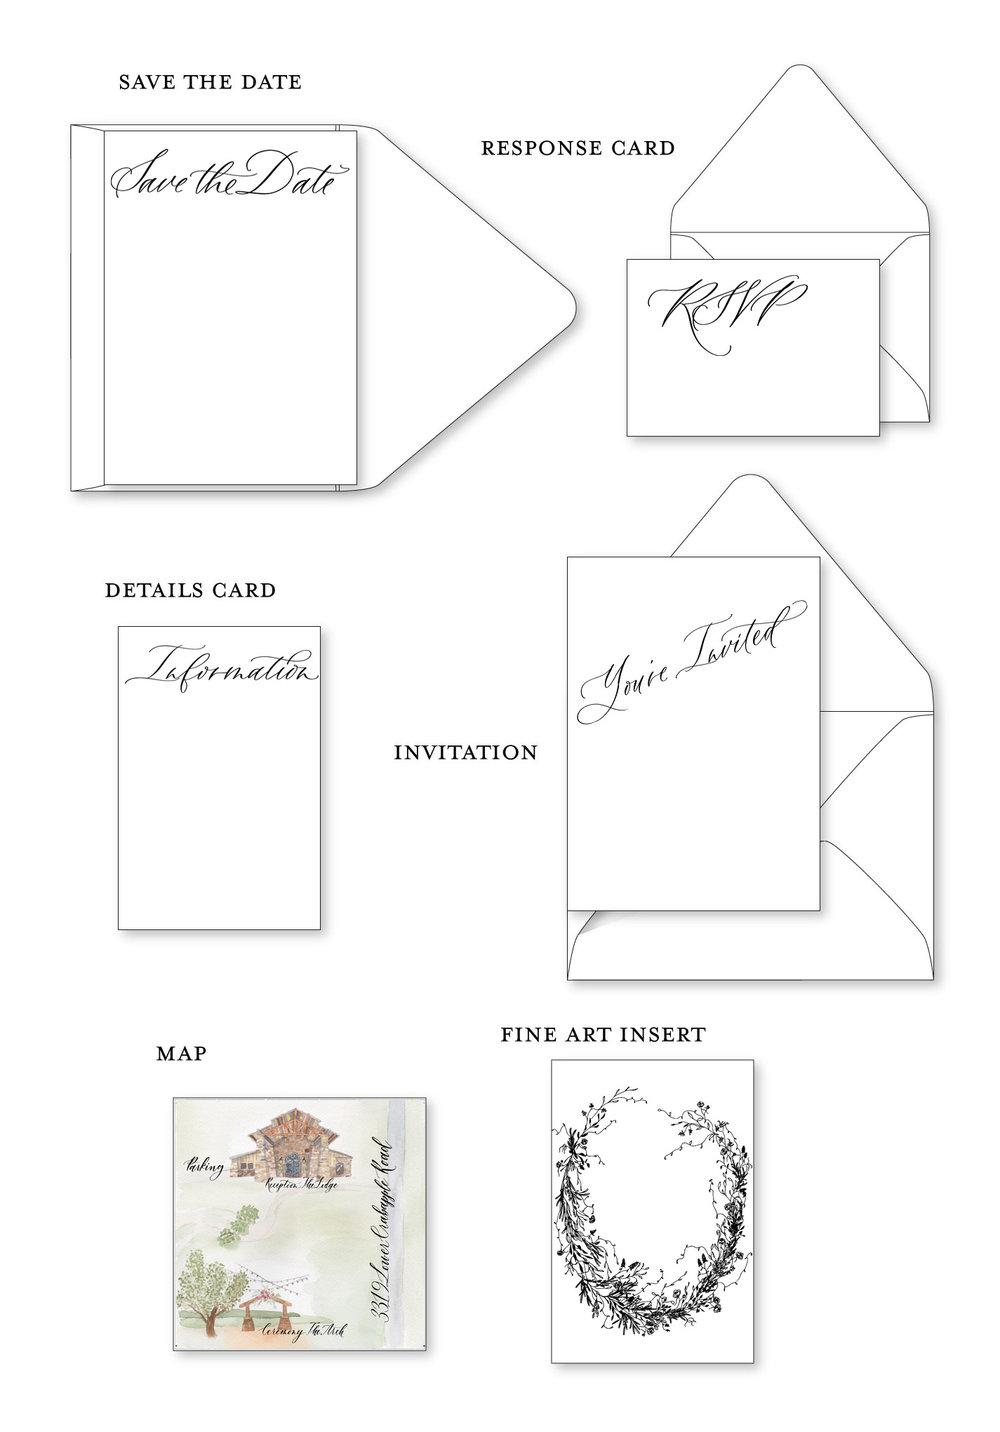 heirloom-graphic copy.jpg